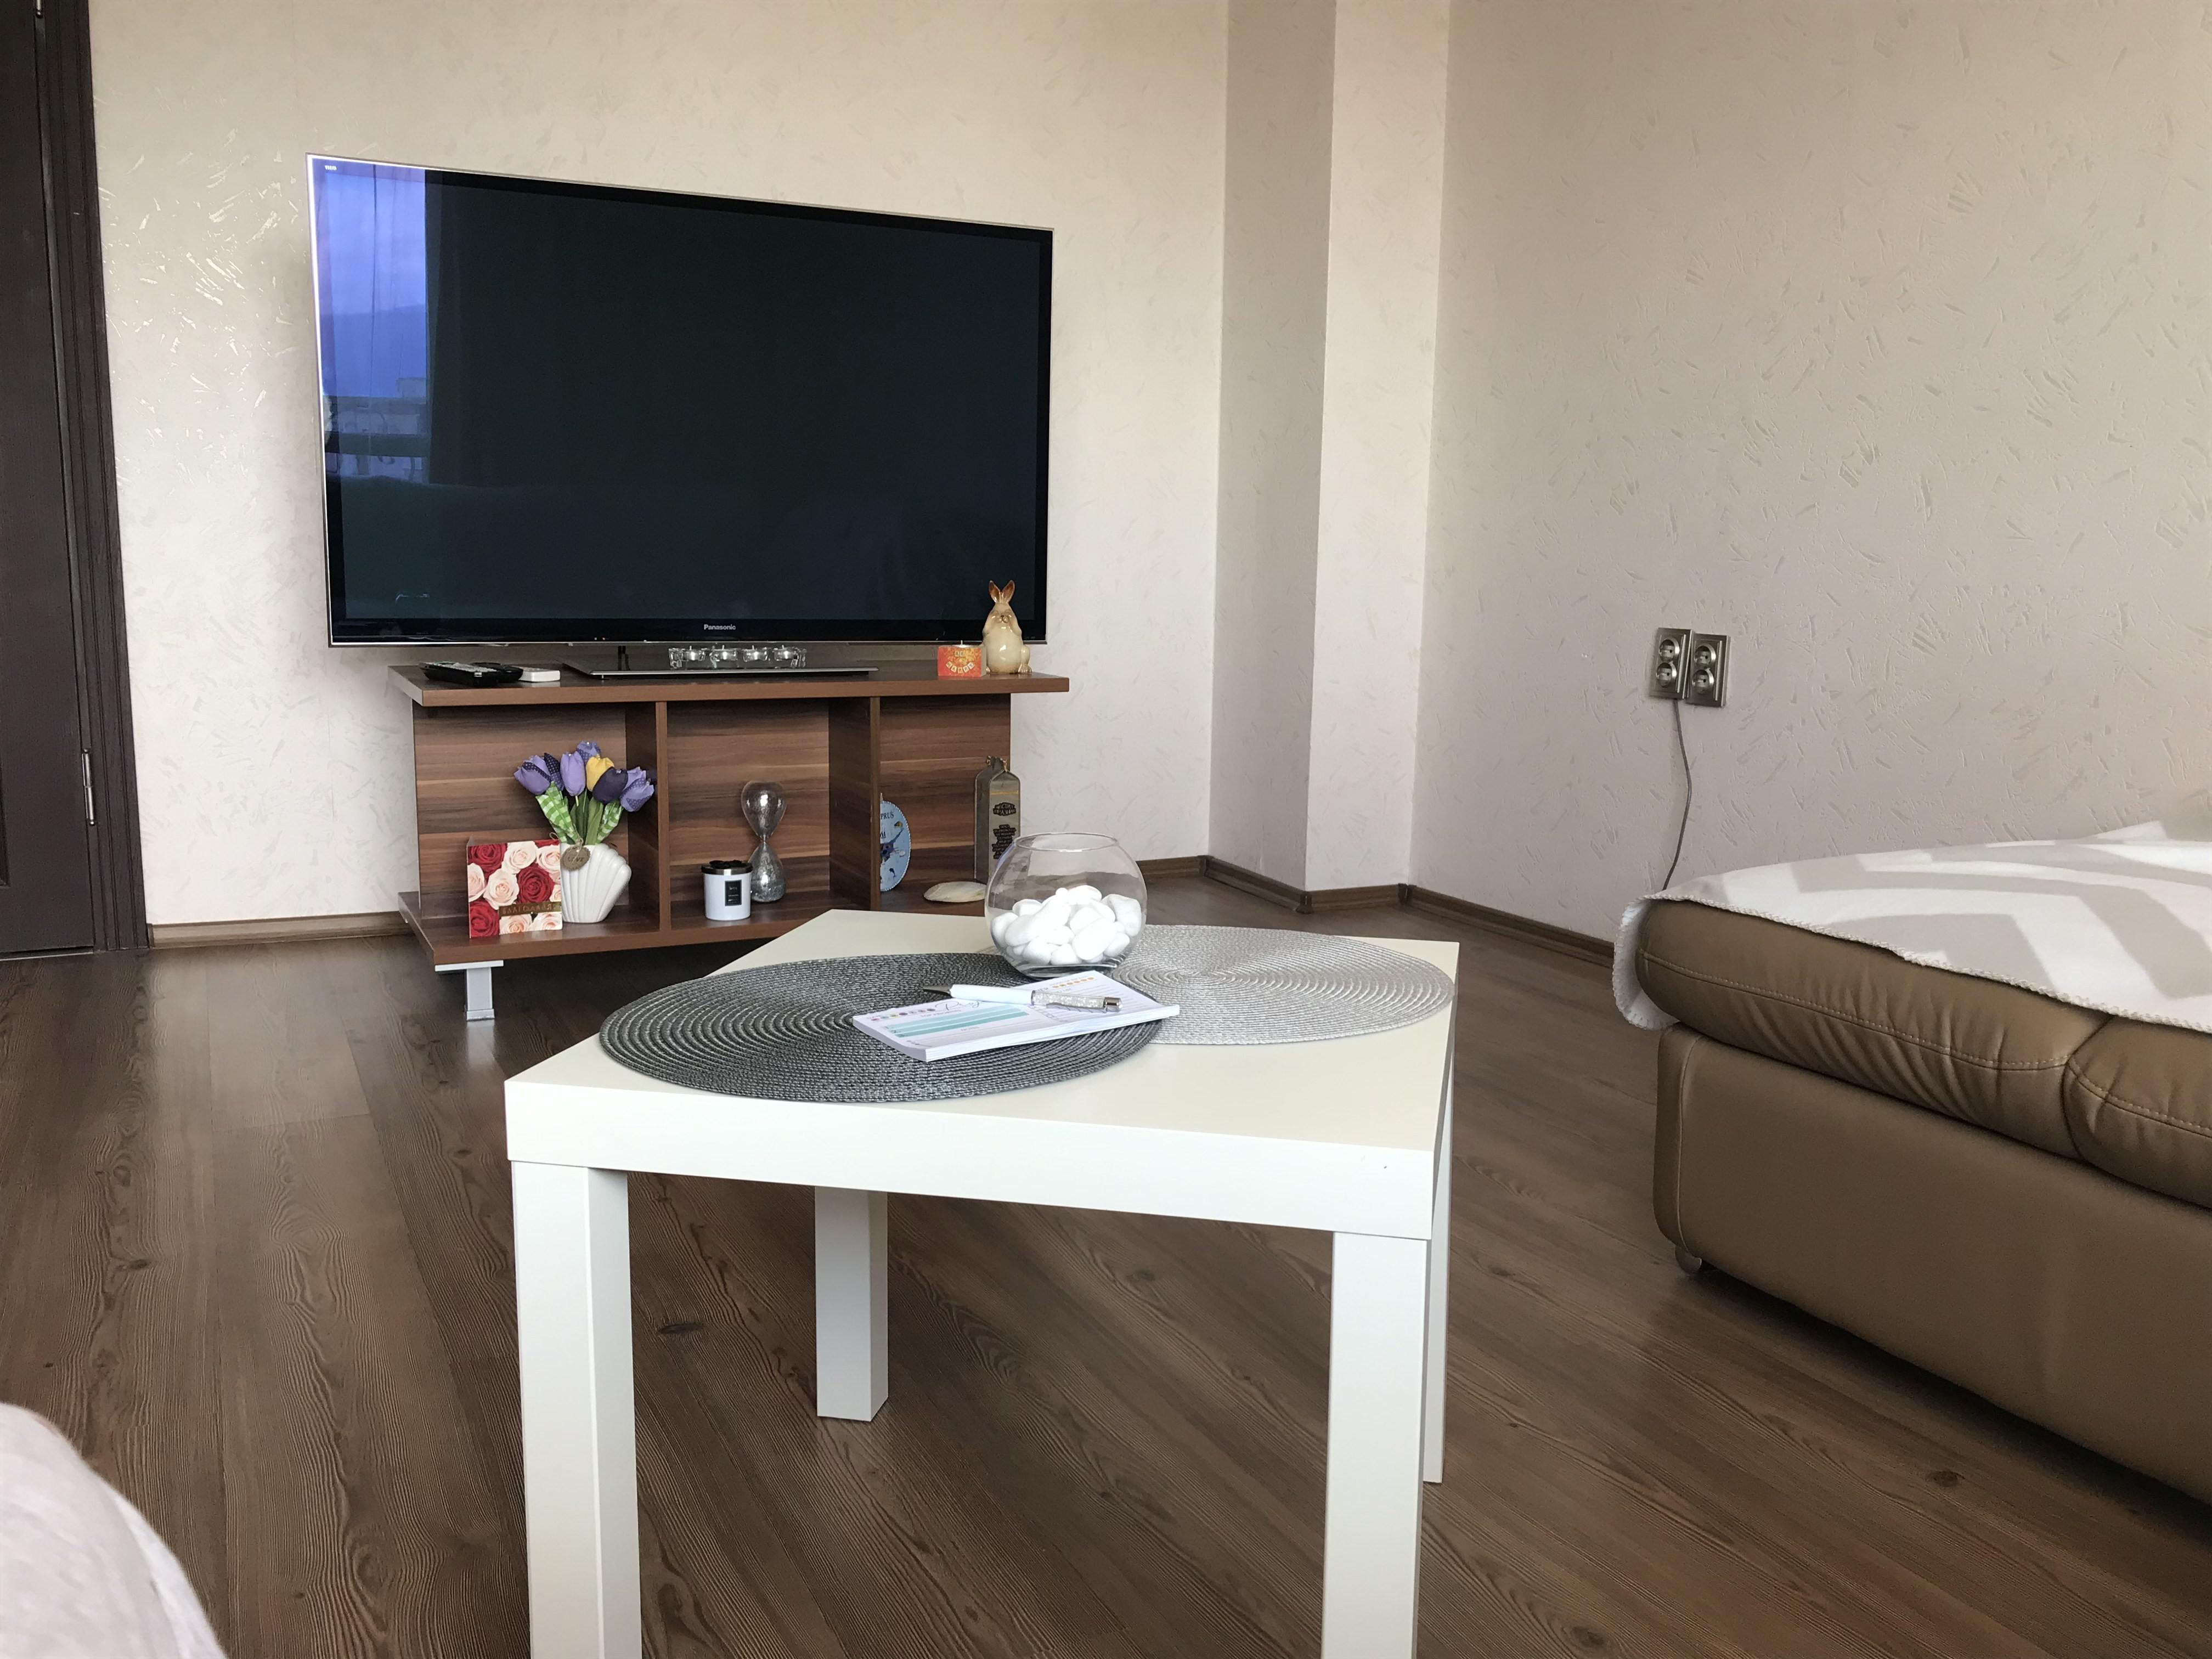 Двустаен апартамент под наем в Пловдив